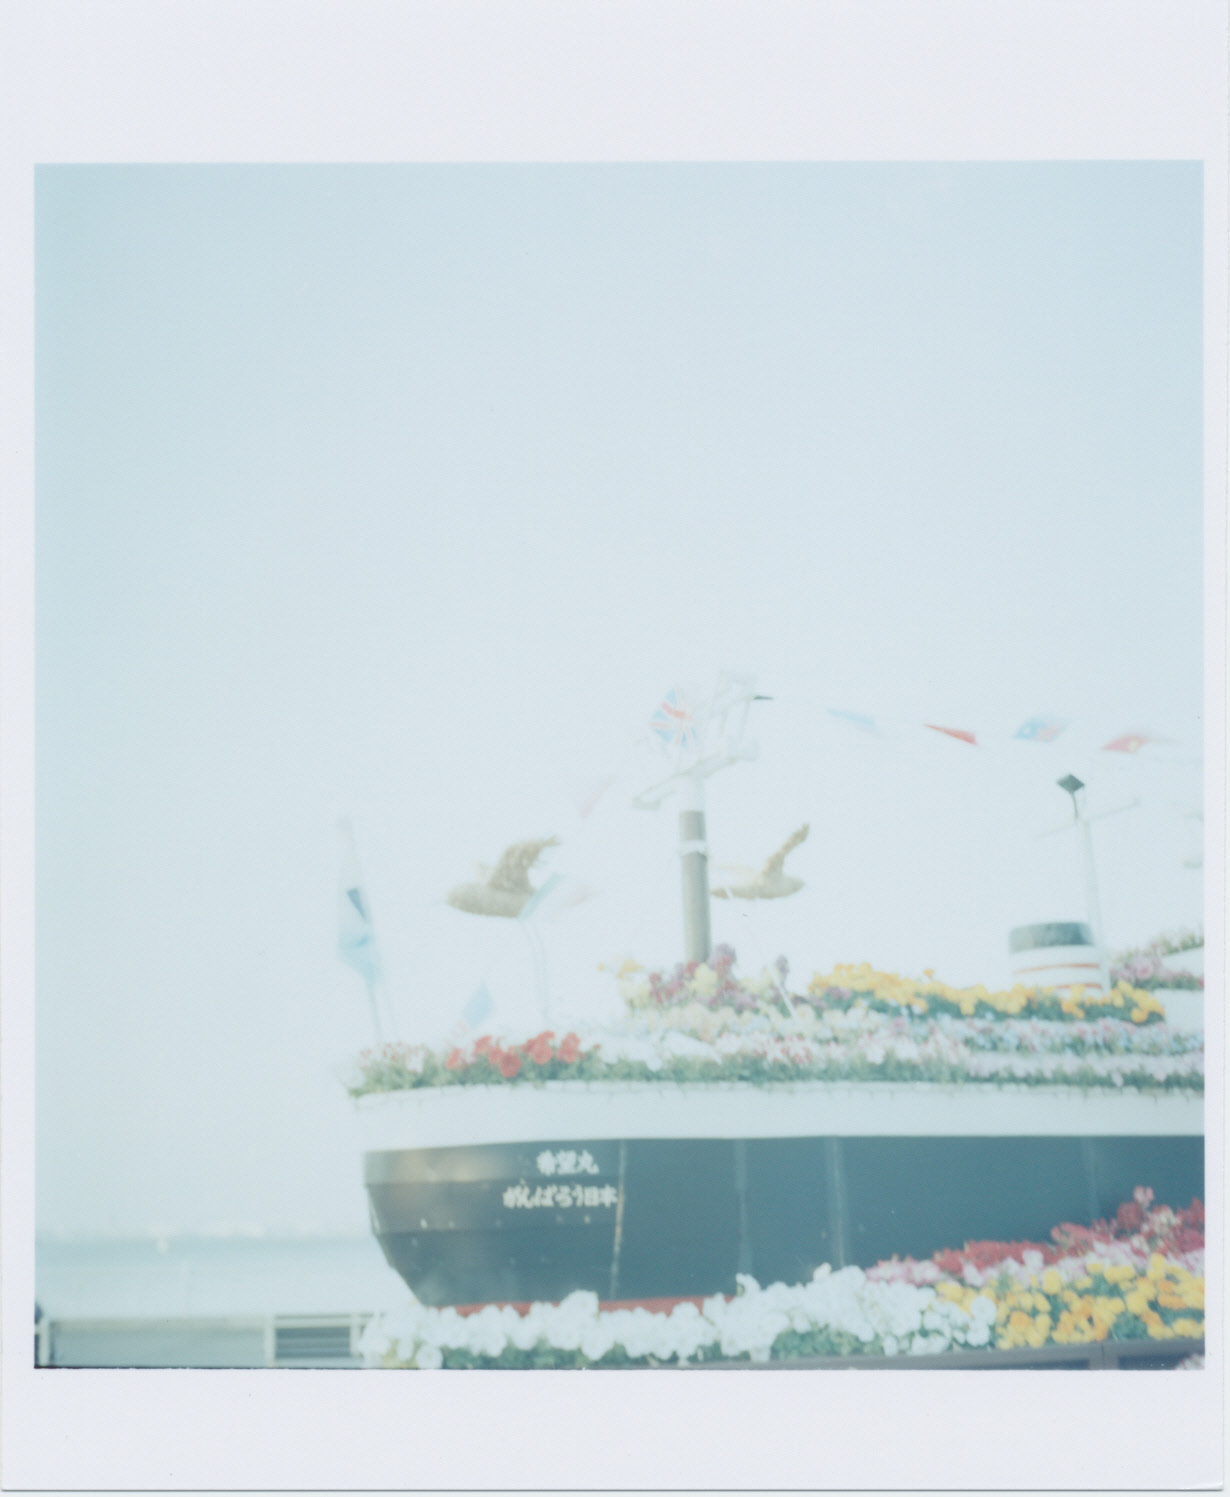 Kodak_PORTRA_160NC_0006